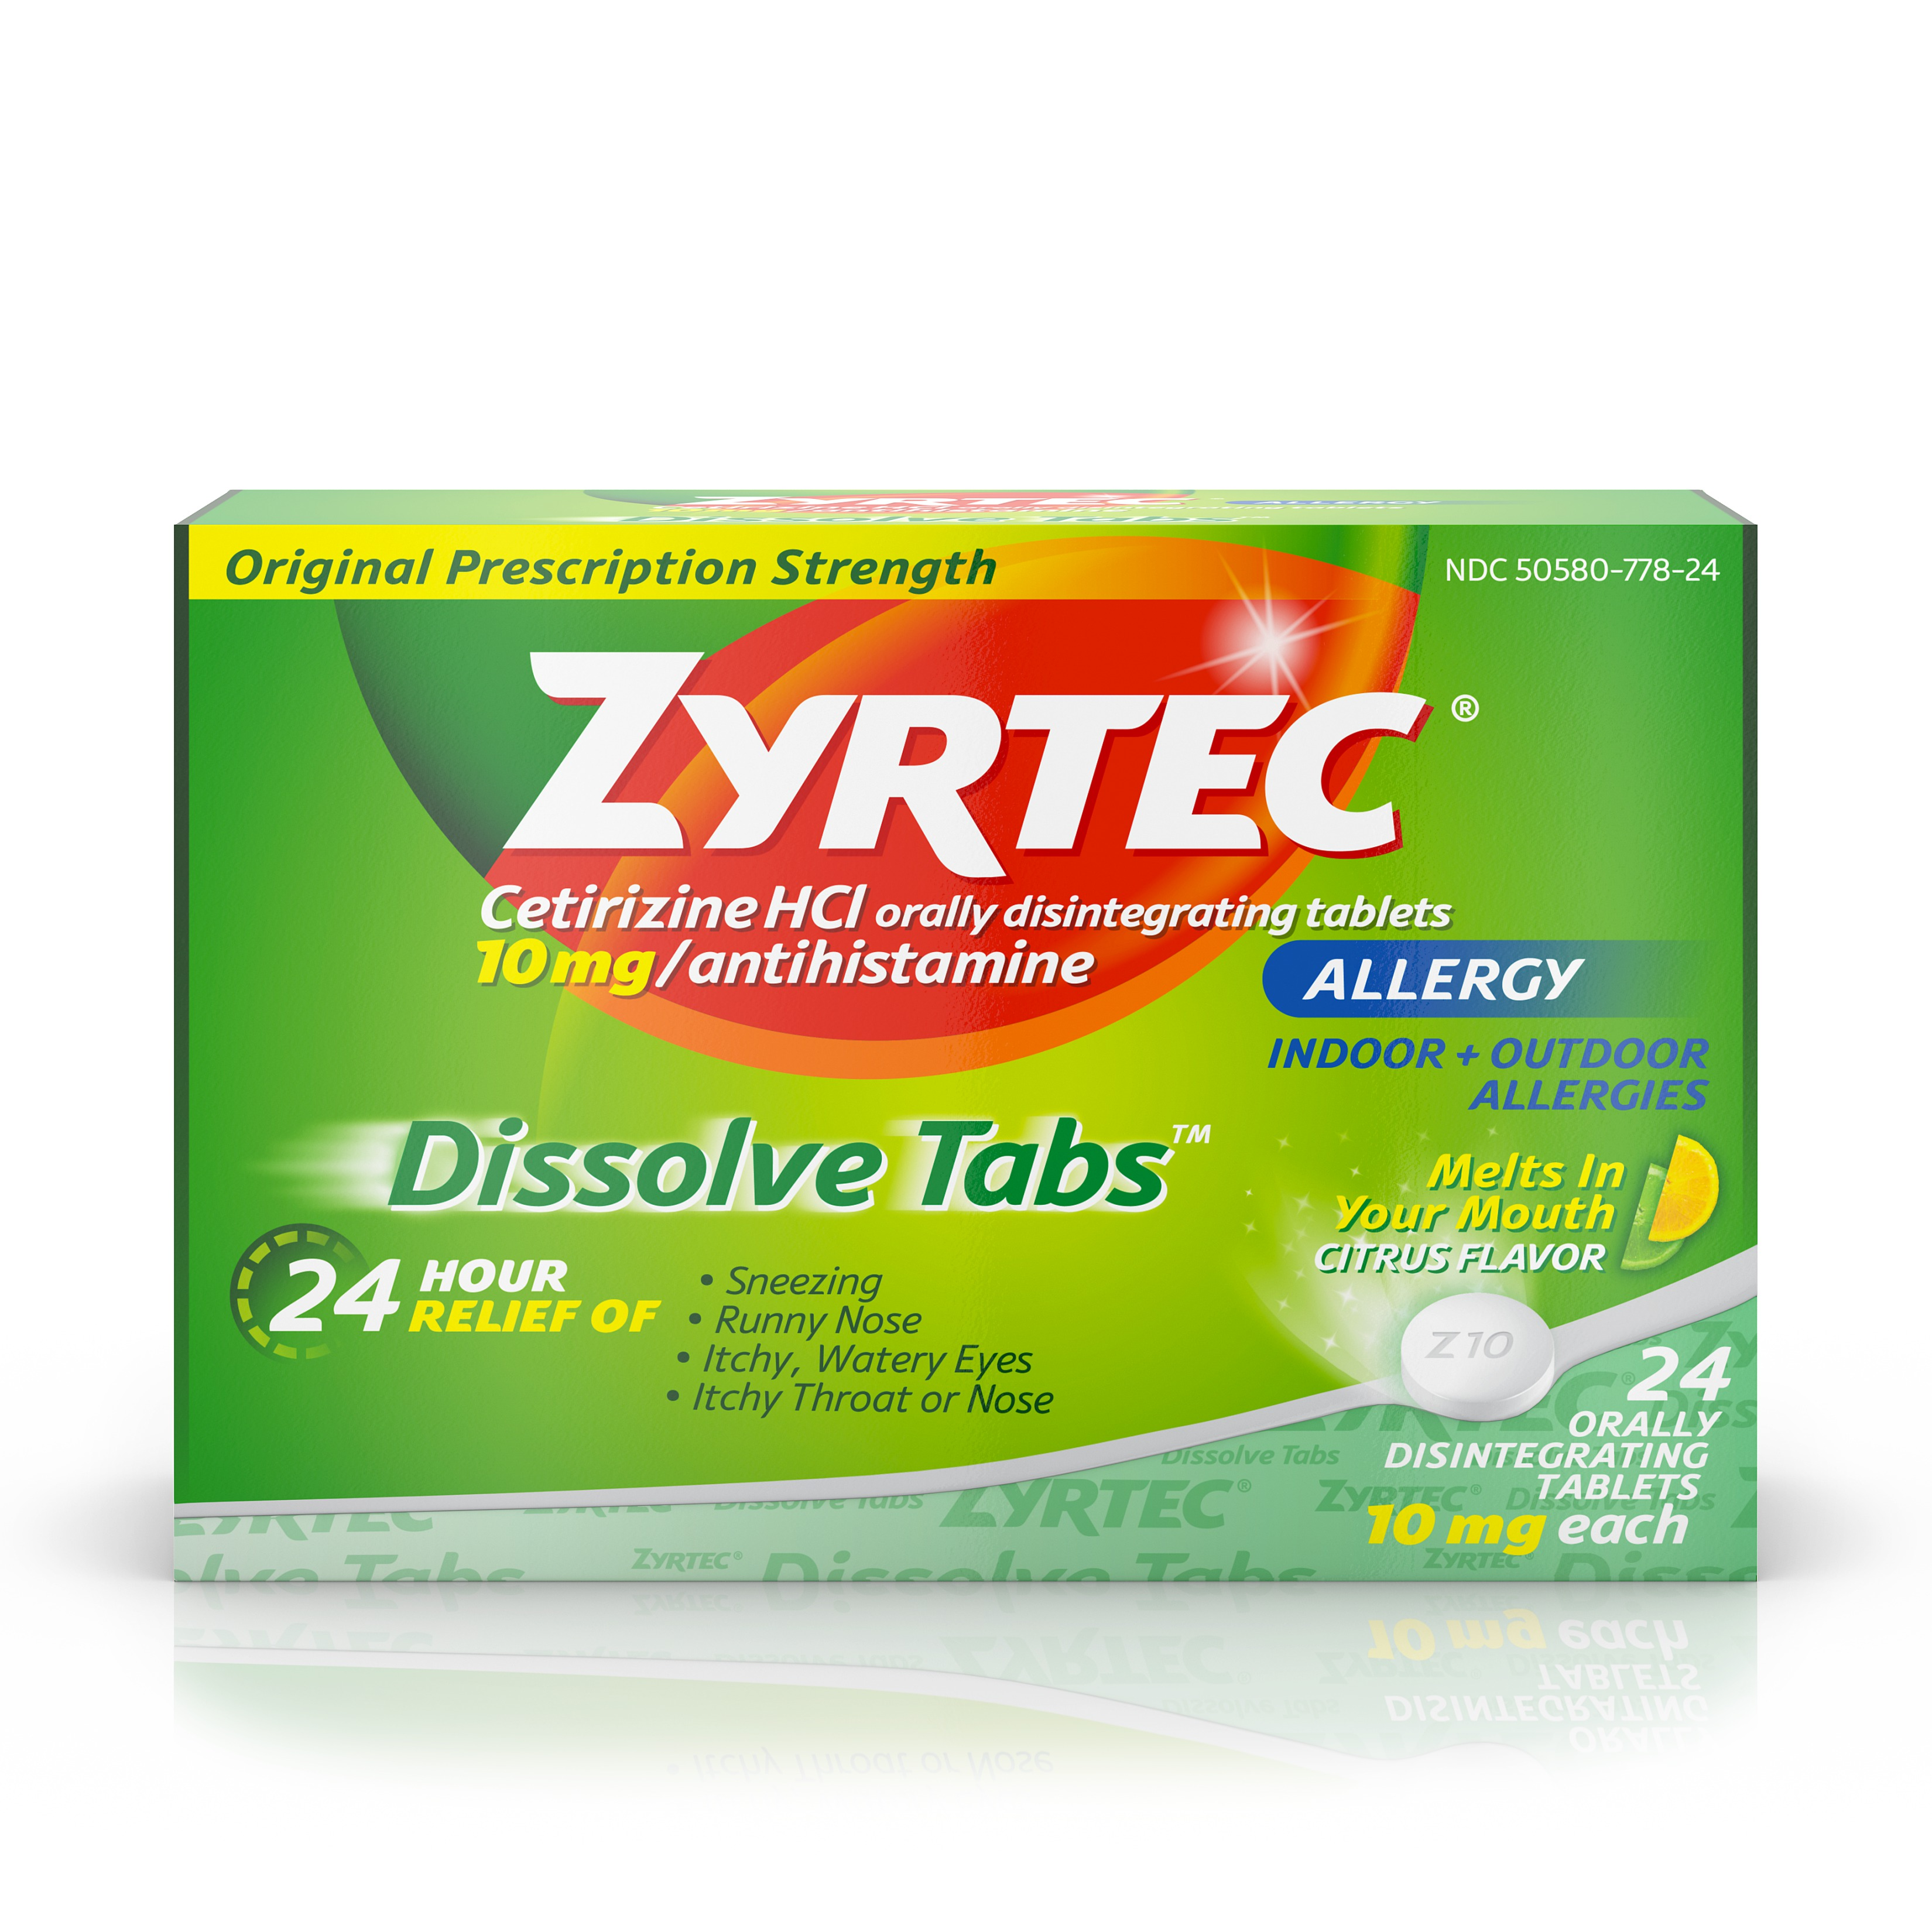 Zyrtec Allergy Dissolve Tablets In Citrus Flavor Cetirizine Hcl 24